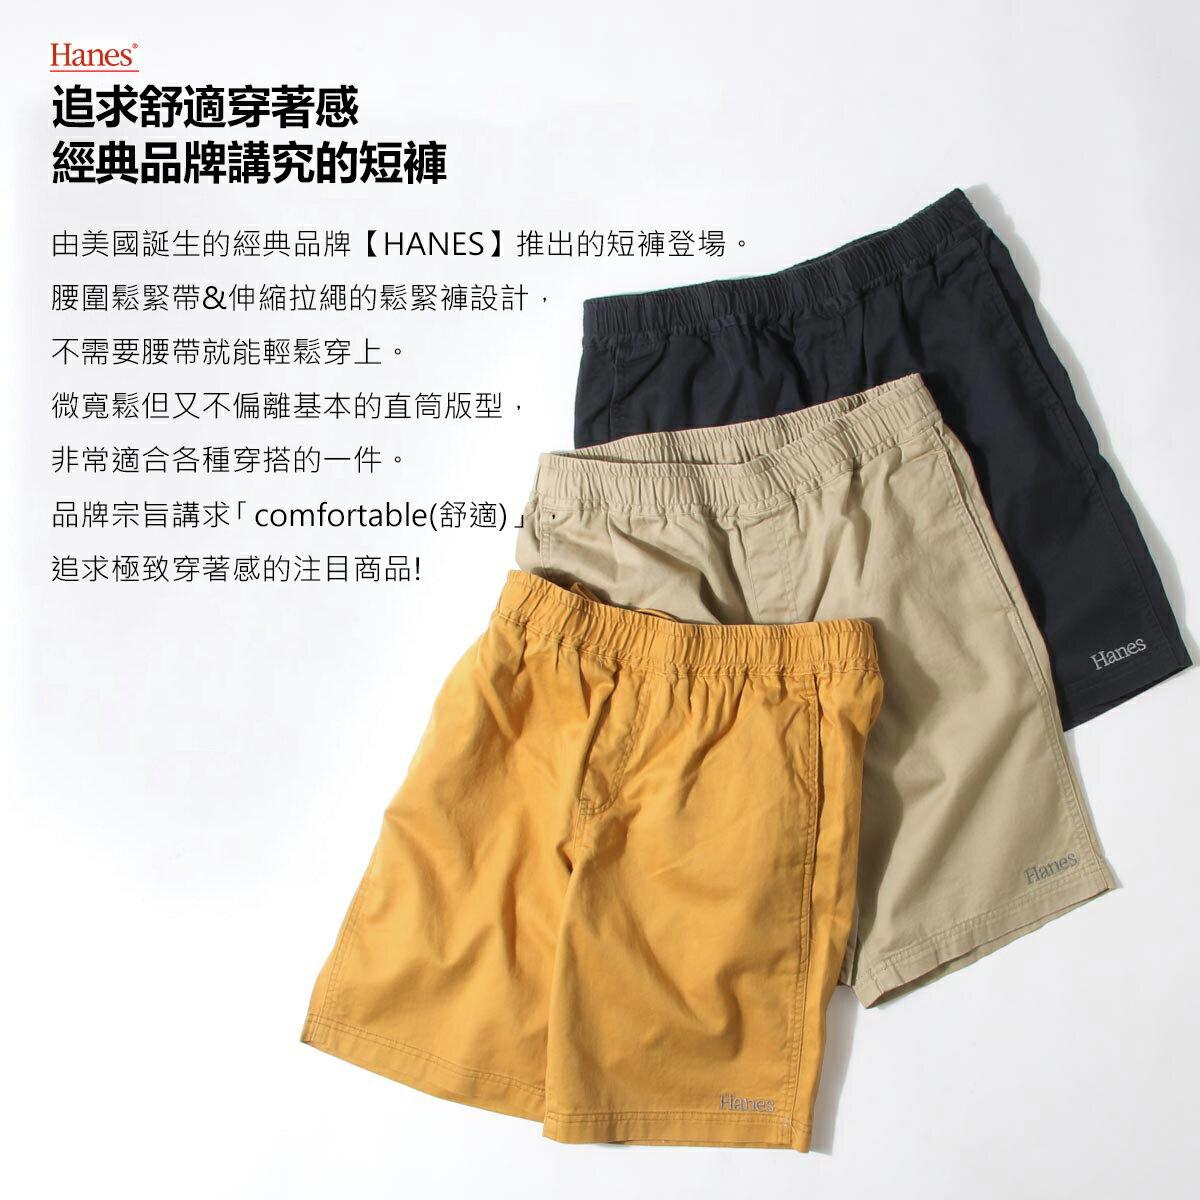 【APP領券再九折】【HANES】直筒鬆緊短褲 對應大尺碼 7